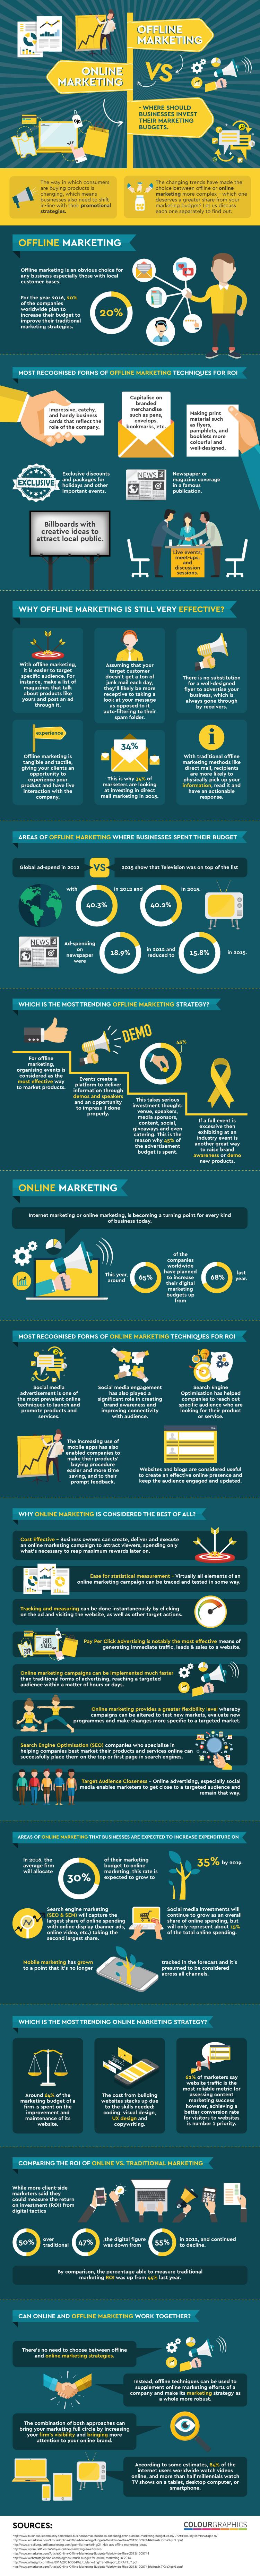 online vs offline marketing infographic